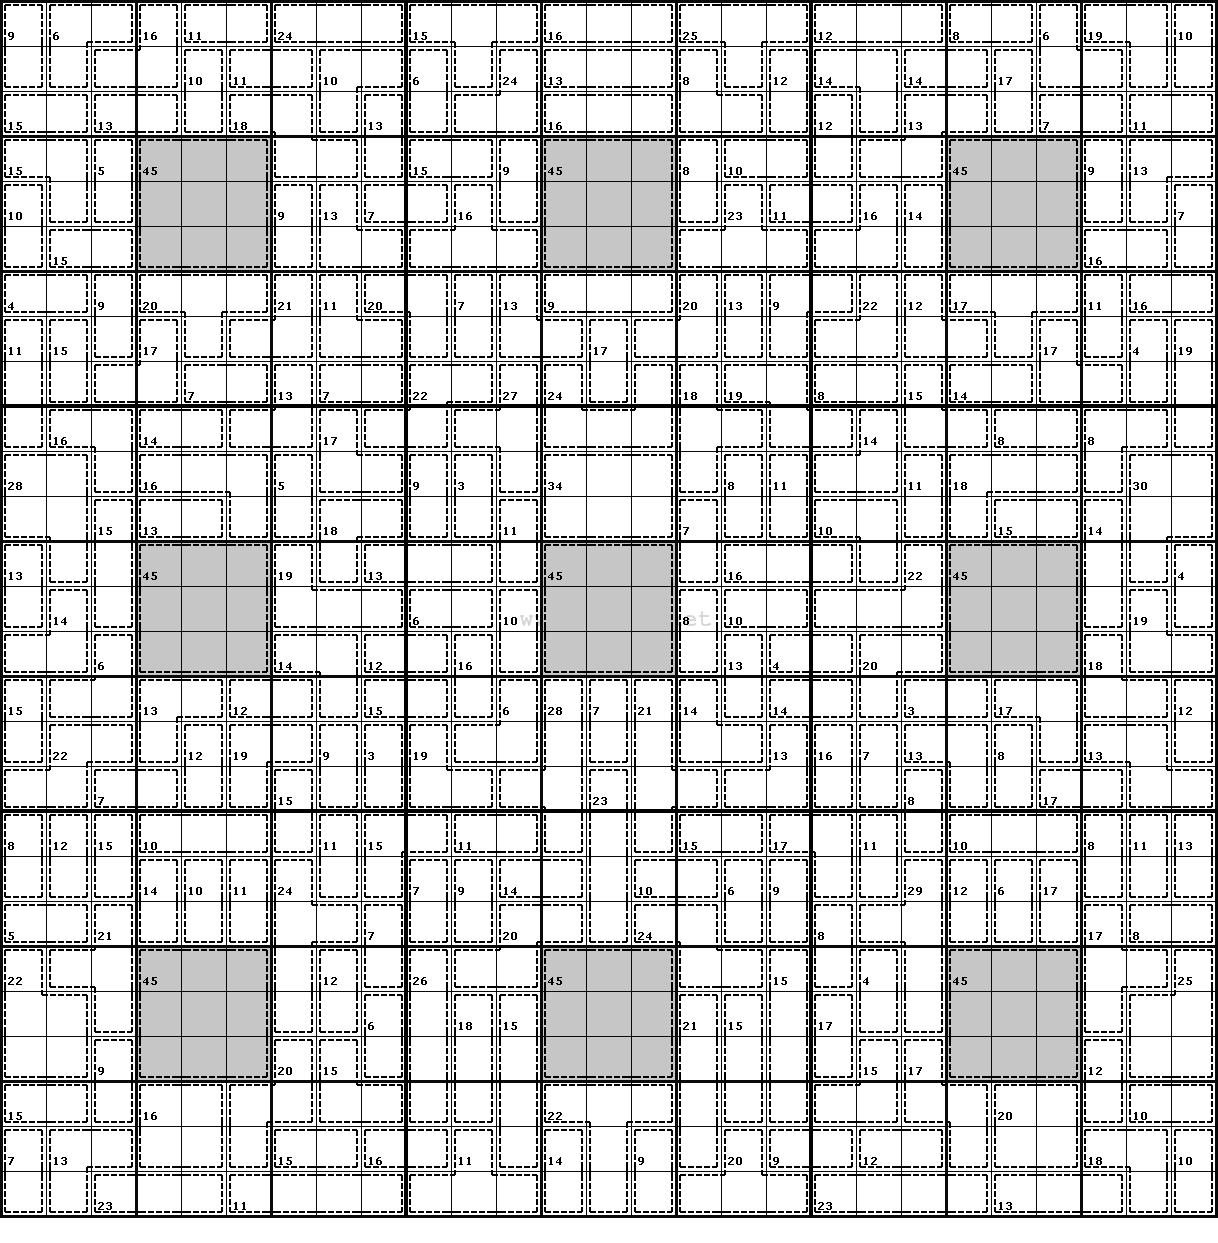 Killer Sudoku Online - Ecosia - Killer Sudoku Free Printable